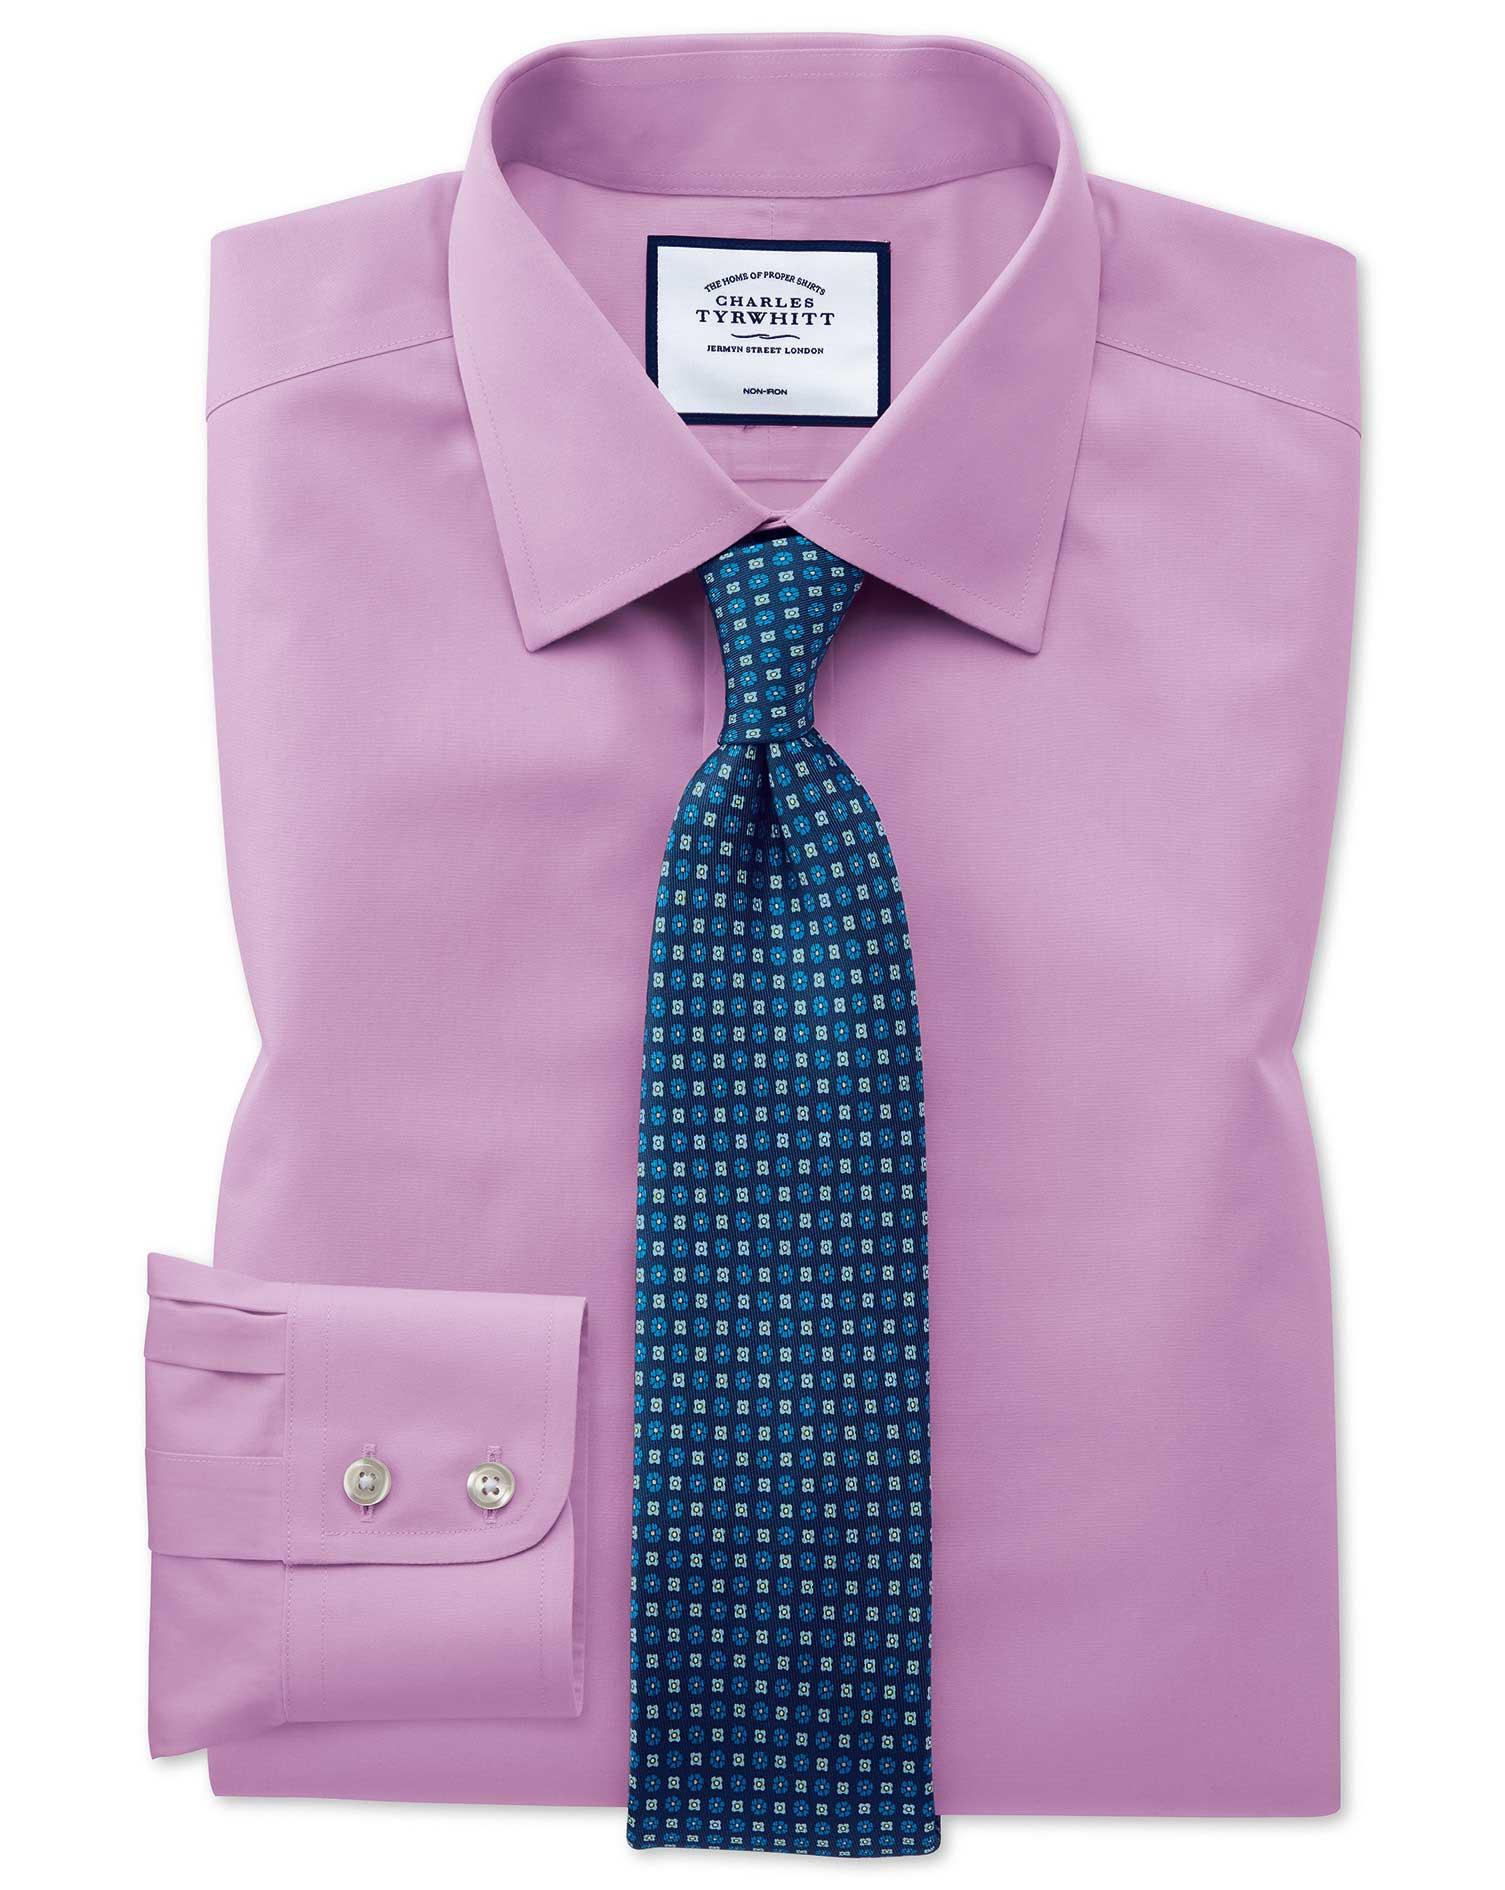 Cotton Slim Fit Violet Non-Iron Poplin Shirt